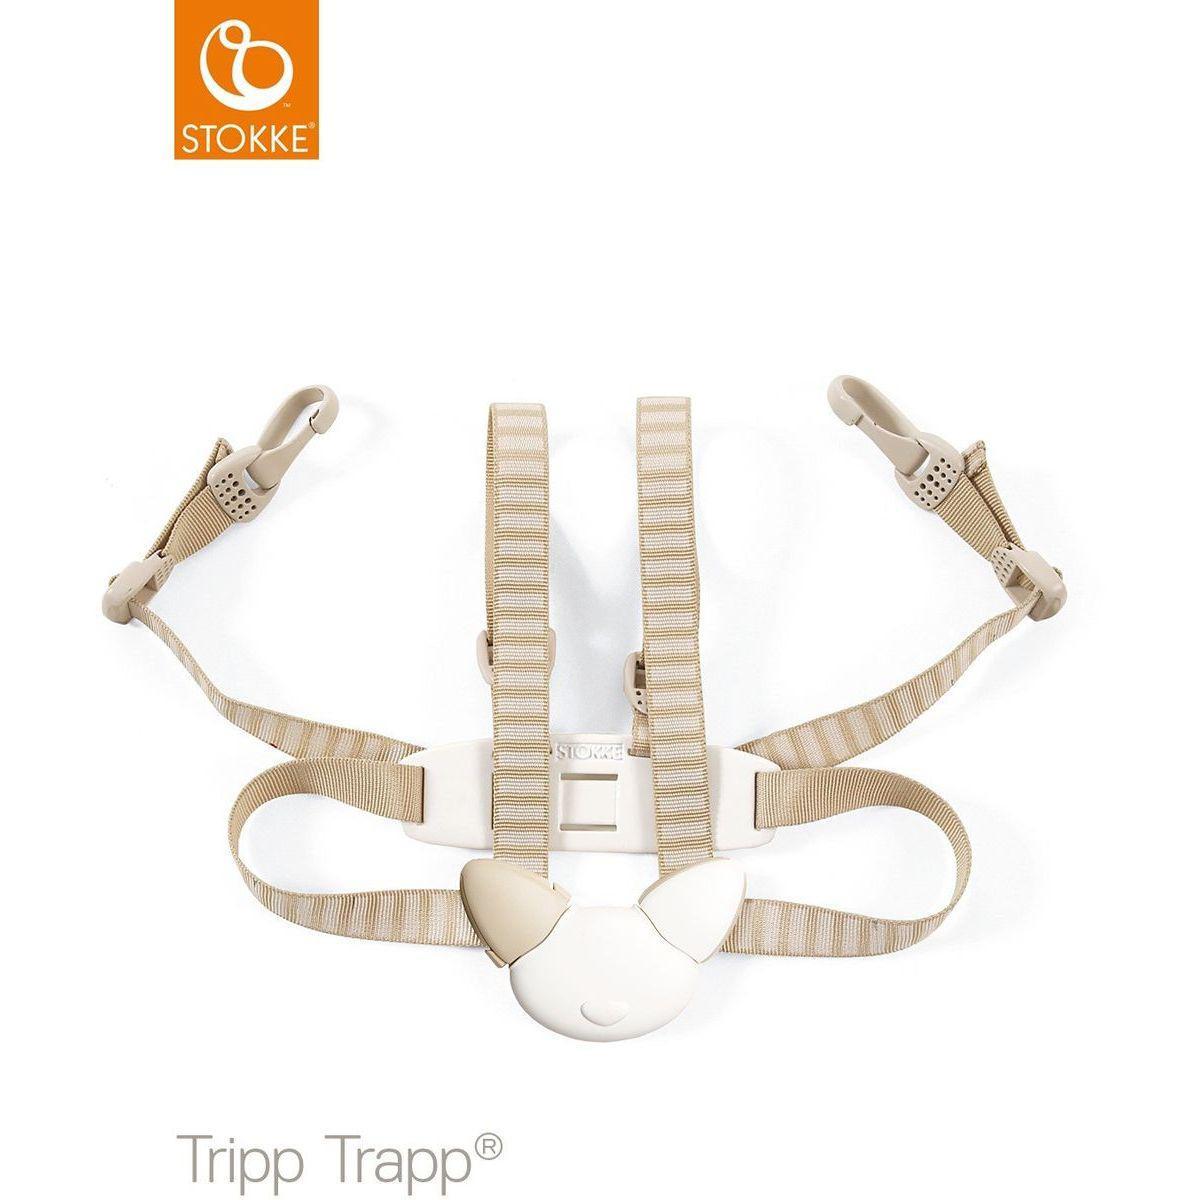 Harnais chaise haute TRIPP TRAPP Stokke